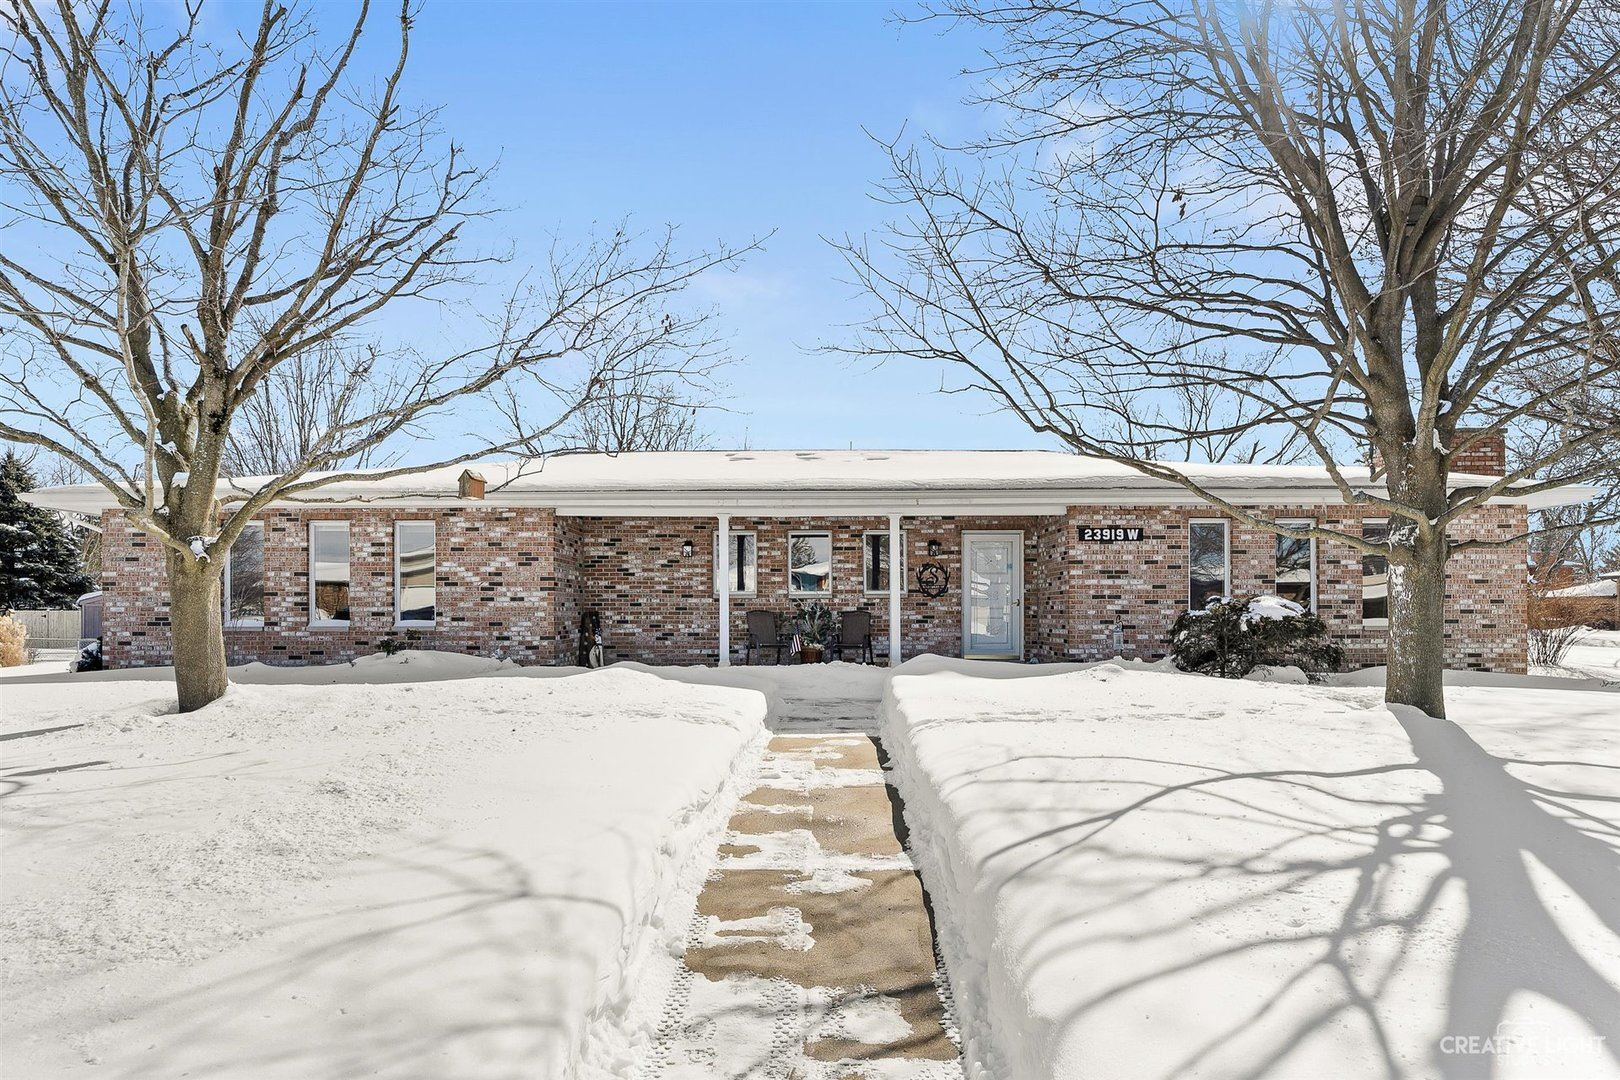 Photo of 23919 W Plainsman Circle, Plainfield, IL 60586 (MLS # 10998915)